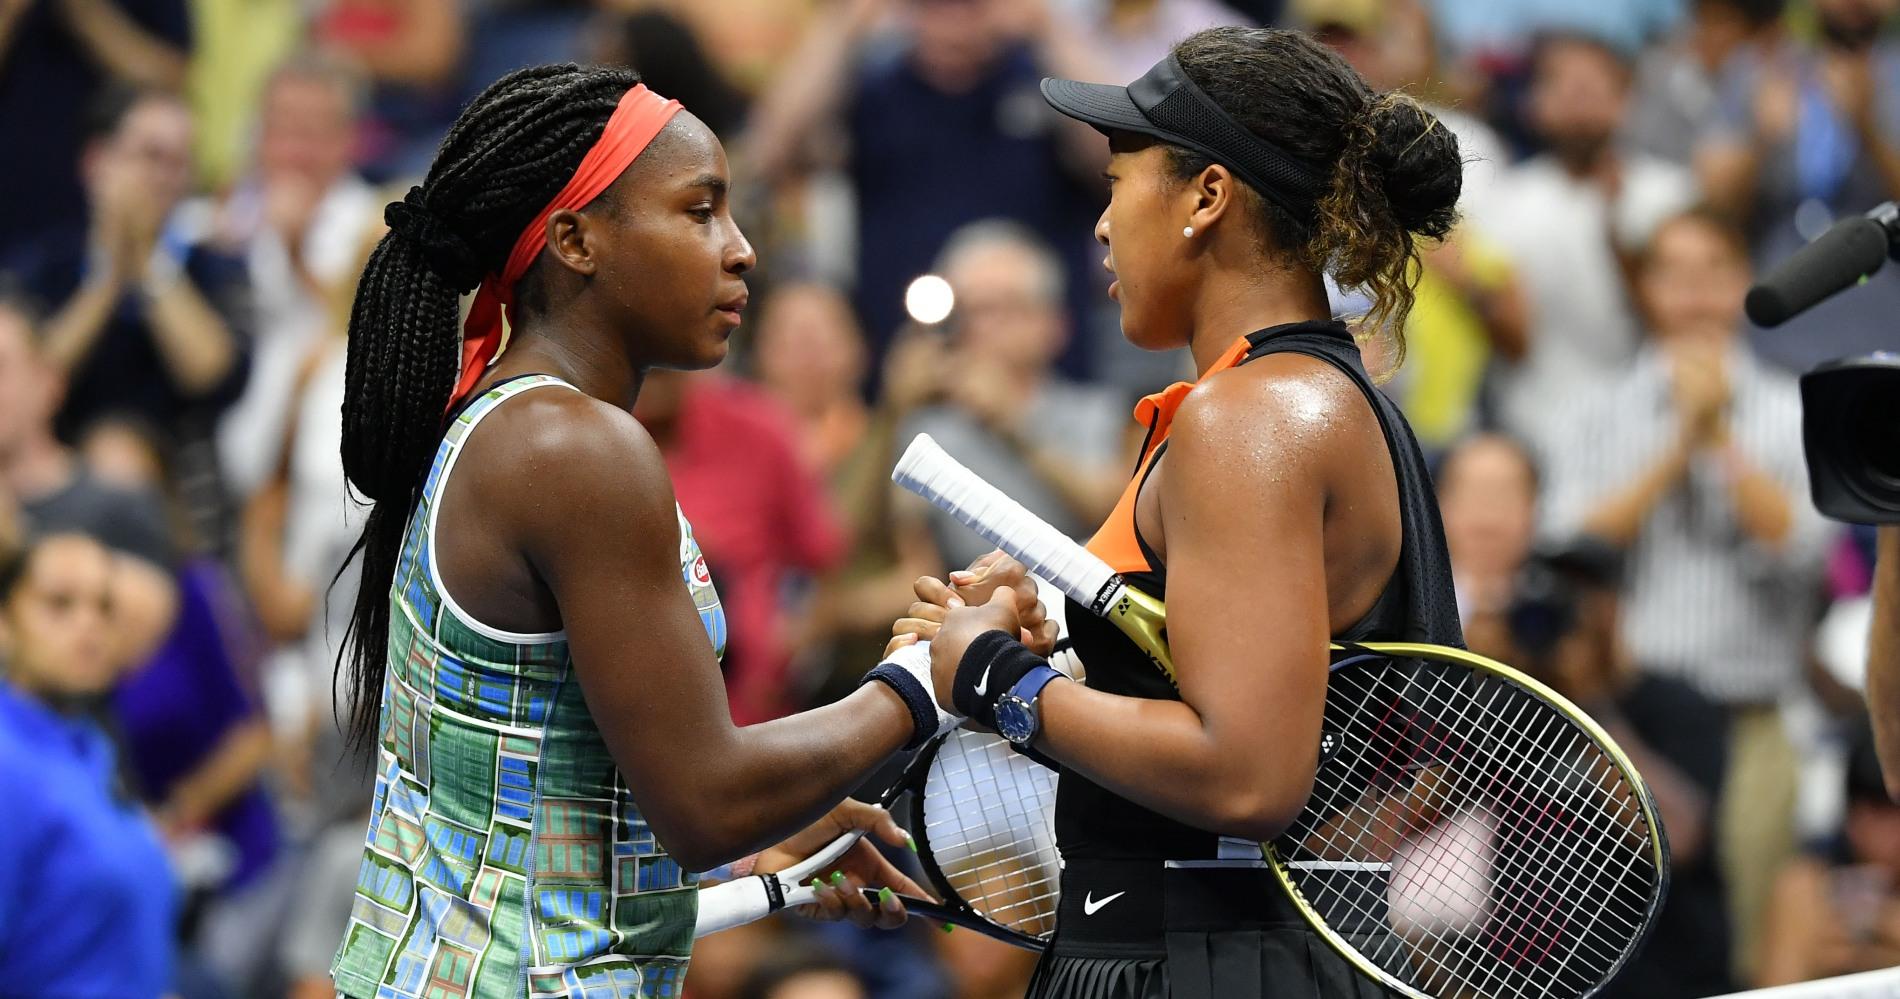 Naomi Osaka and Coco Gauff, US Open 2019